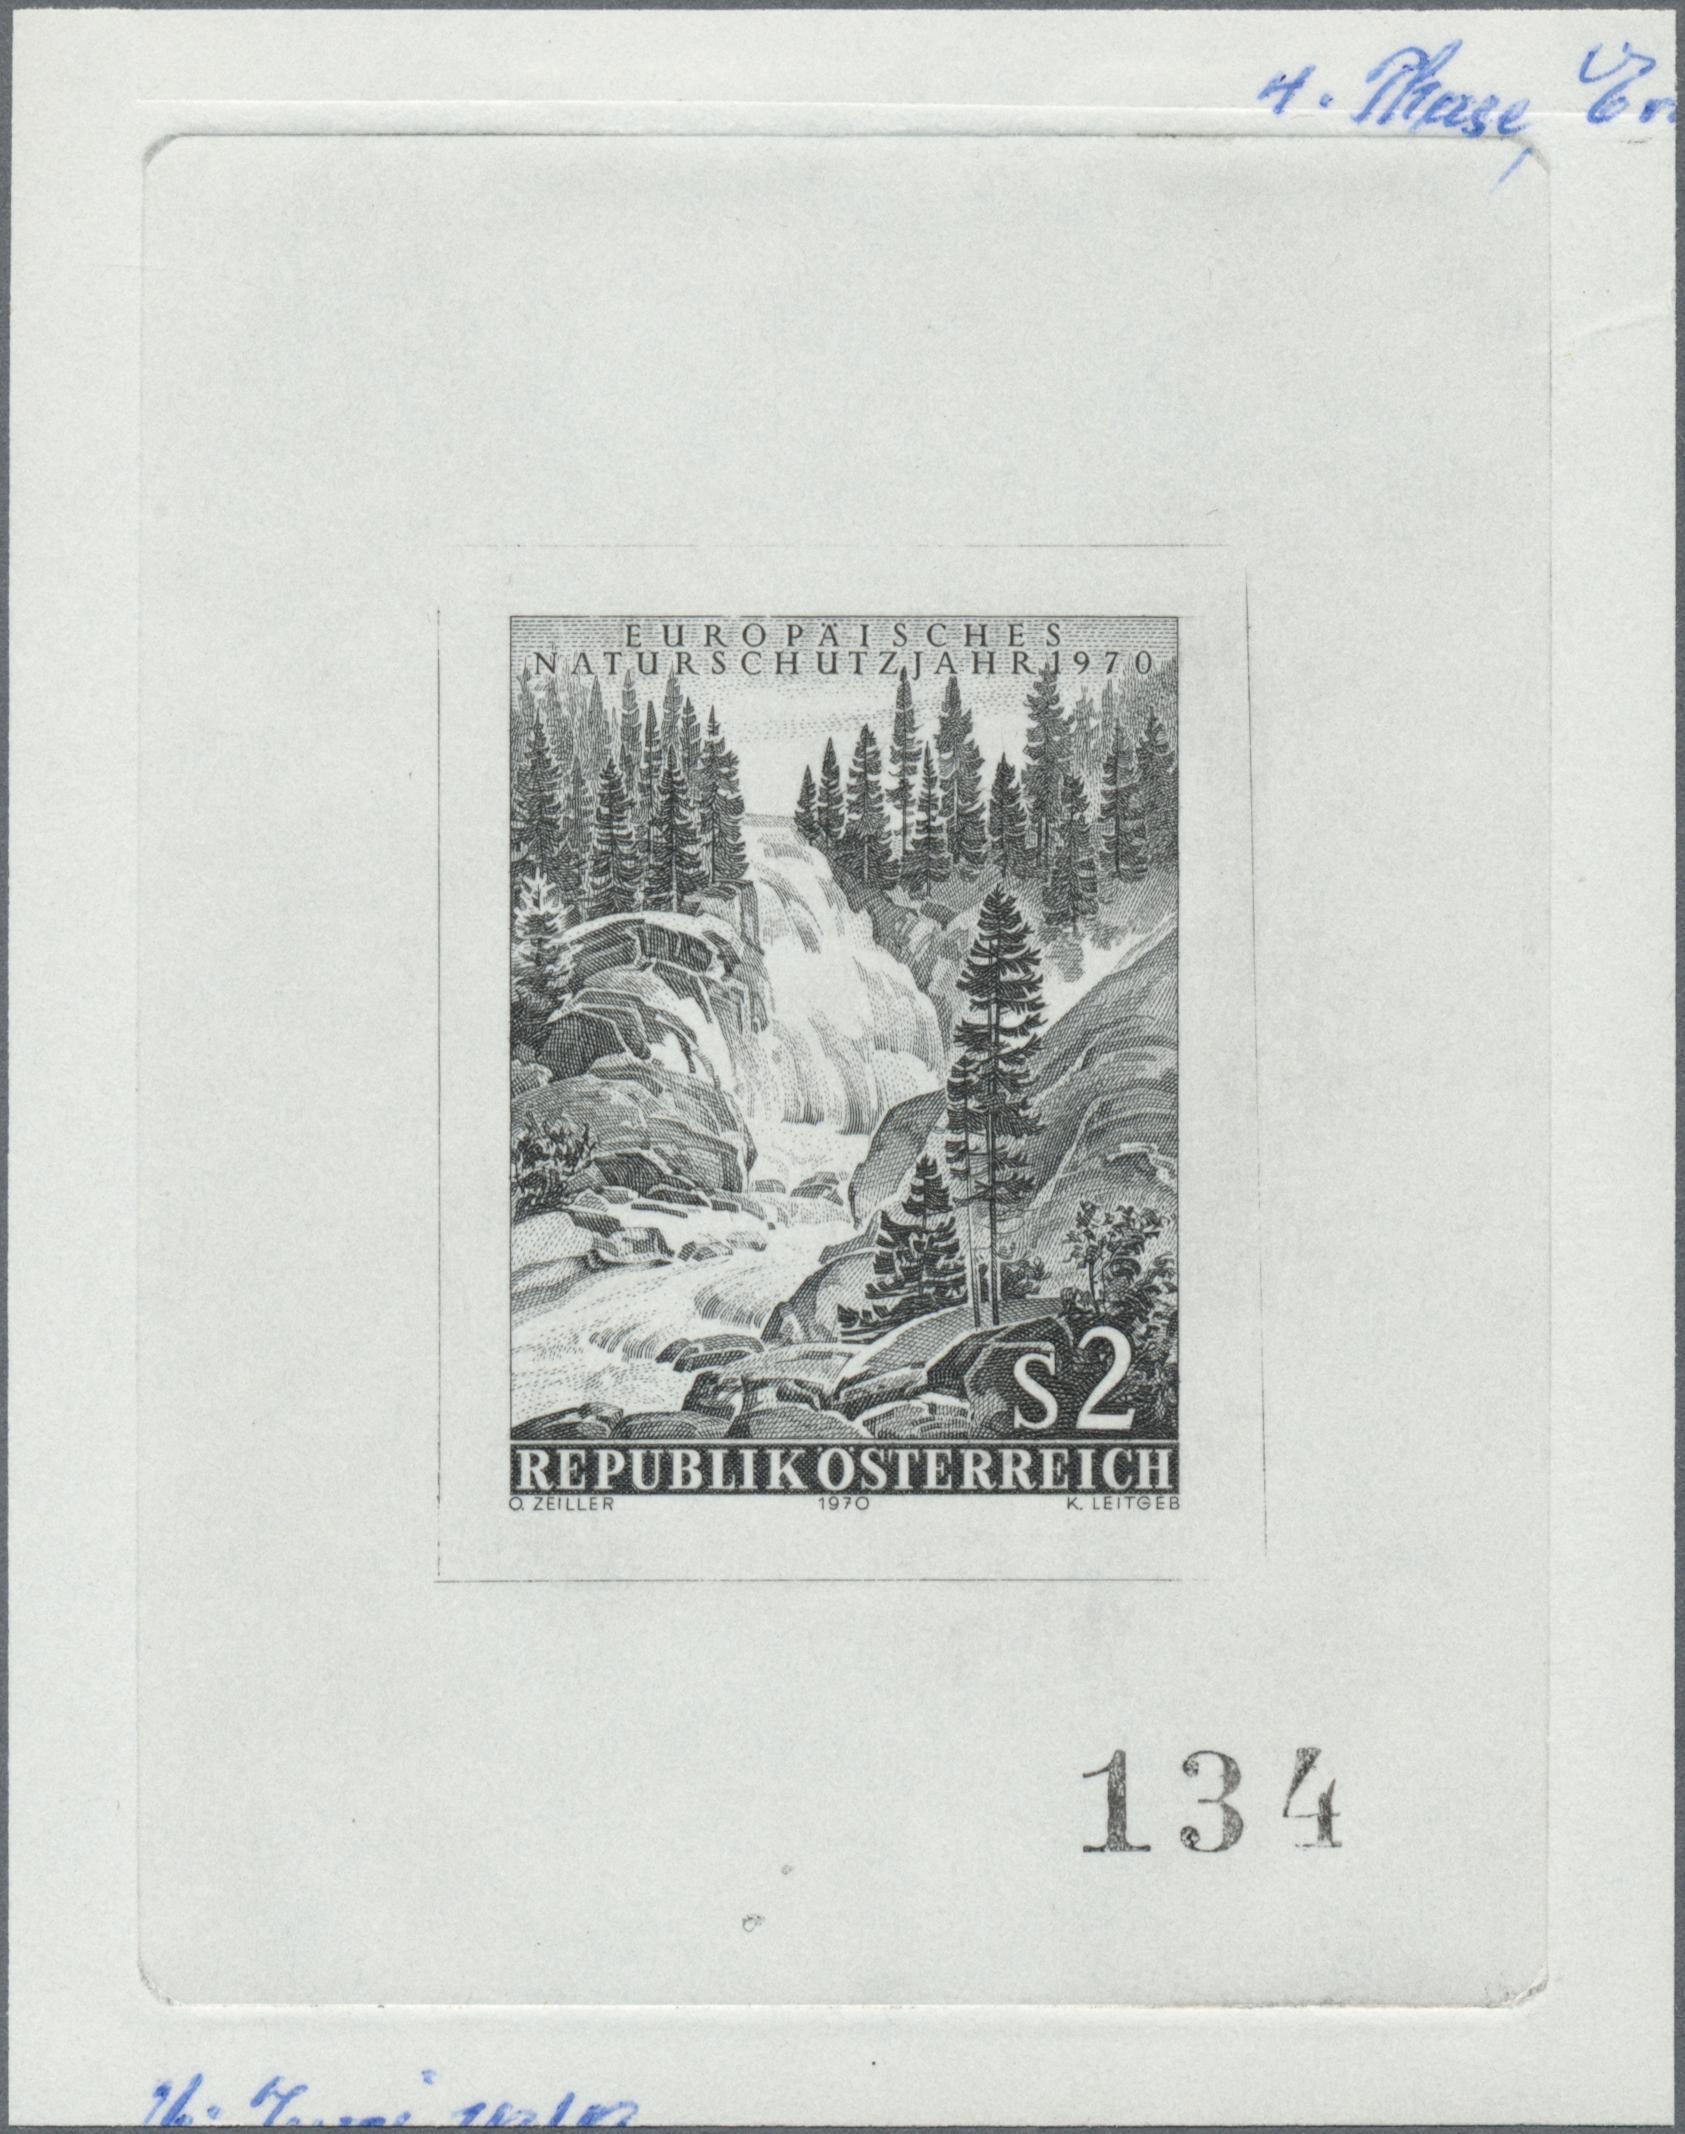 Lot 12864 - thematik: wasserfälle / waterfalls  -  Auktionshaus Christoph Gärtner GmbH & Co. KG Single lots Philately Overseas & Europe. Auction #39 Day 4